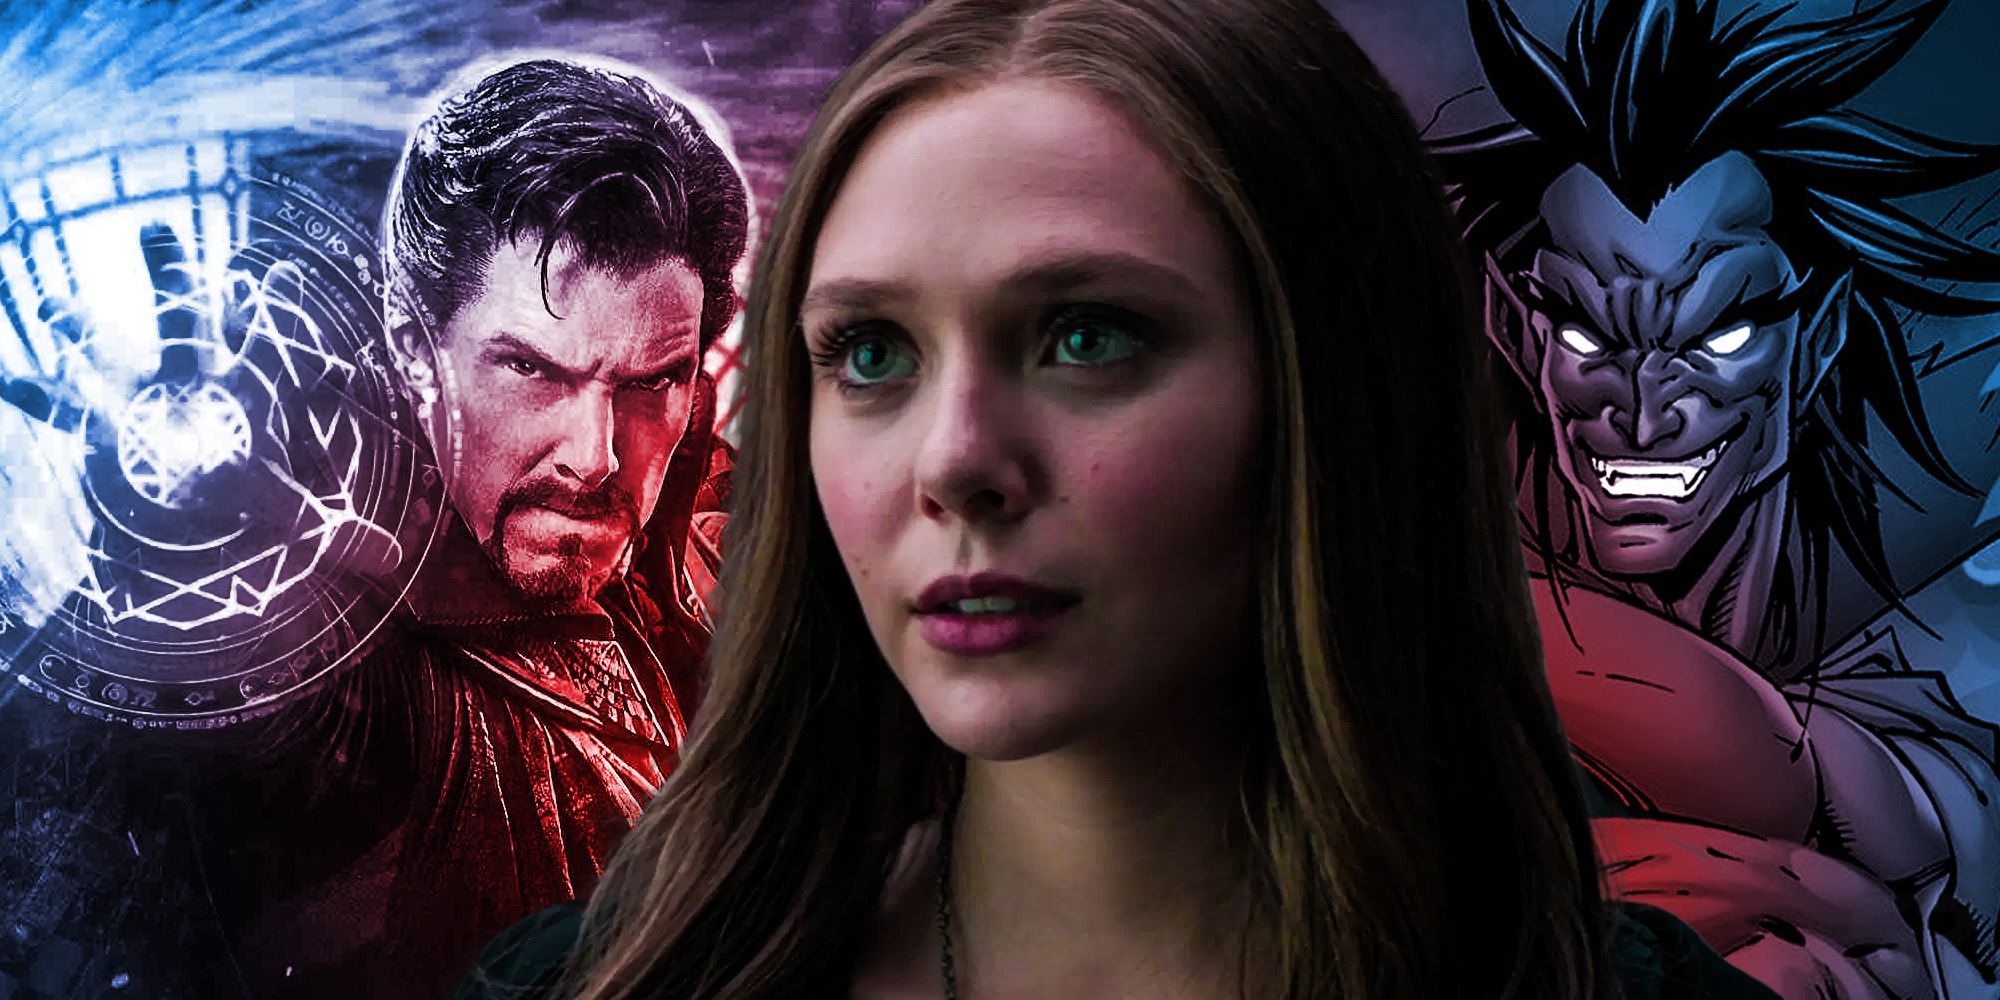 MCU Theory: Doctor Strange 2 & WandaVision's Real Villain (Not Mephisto)